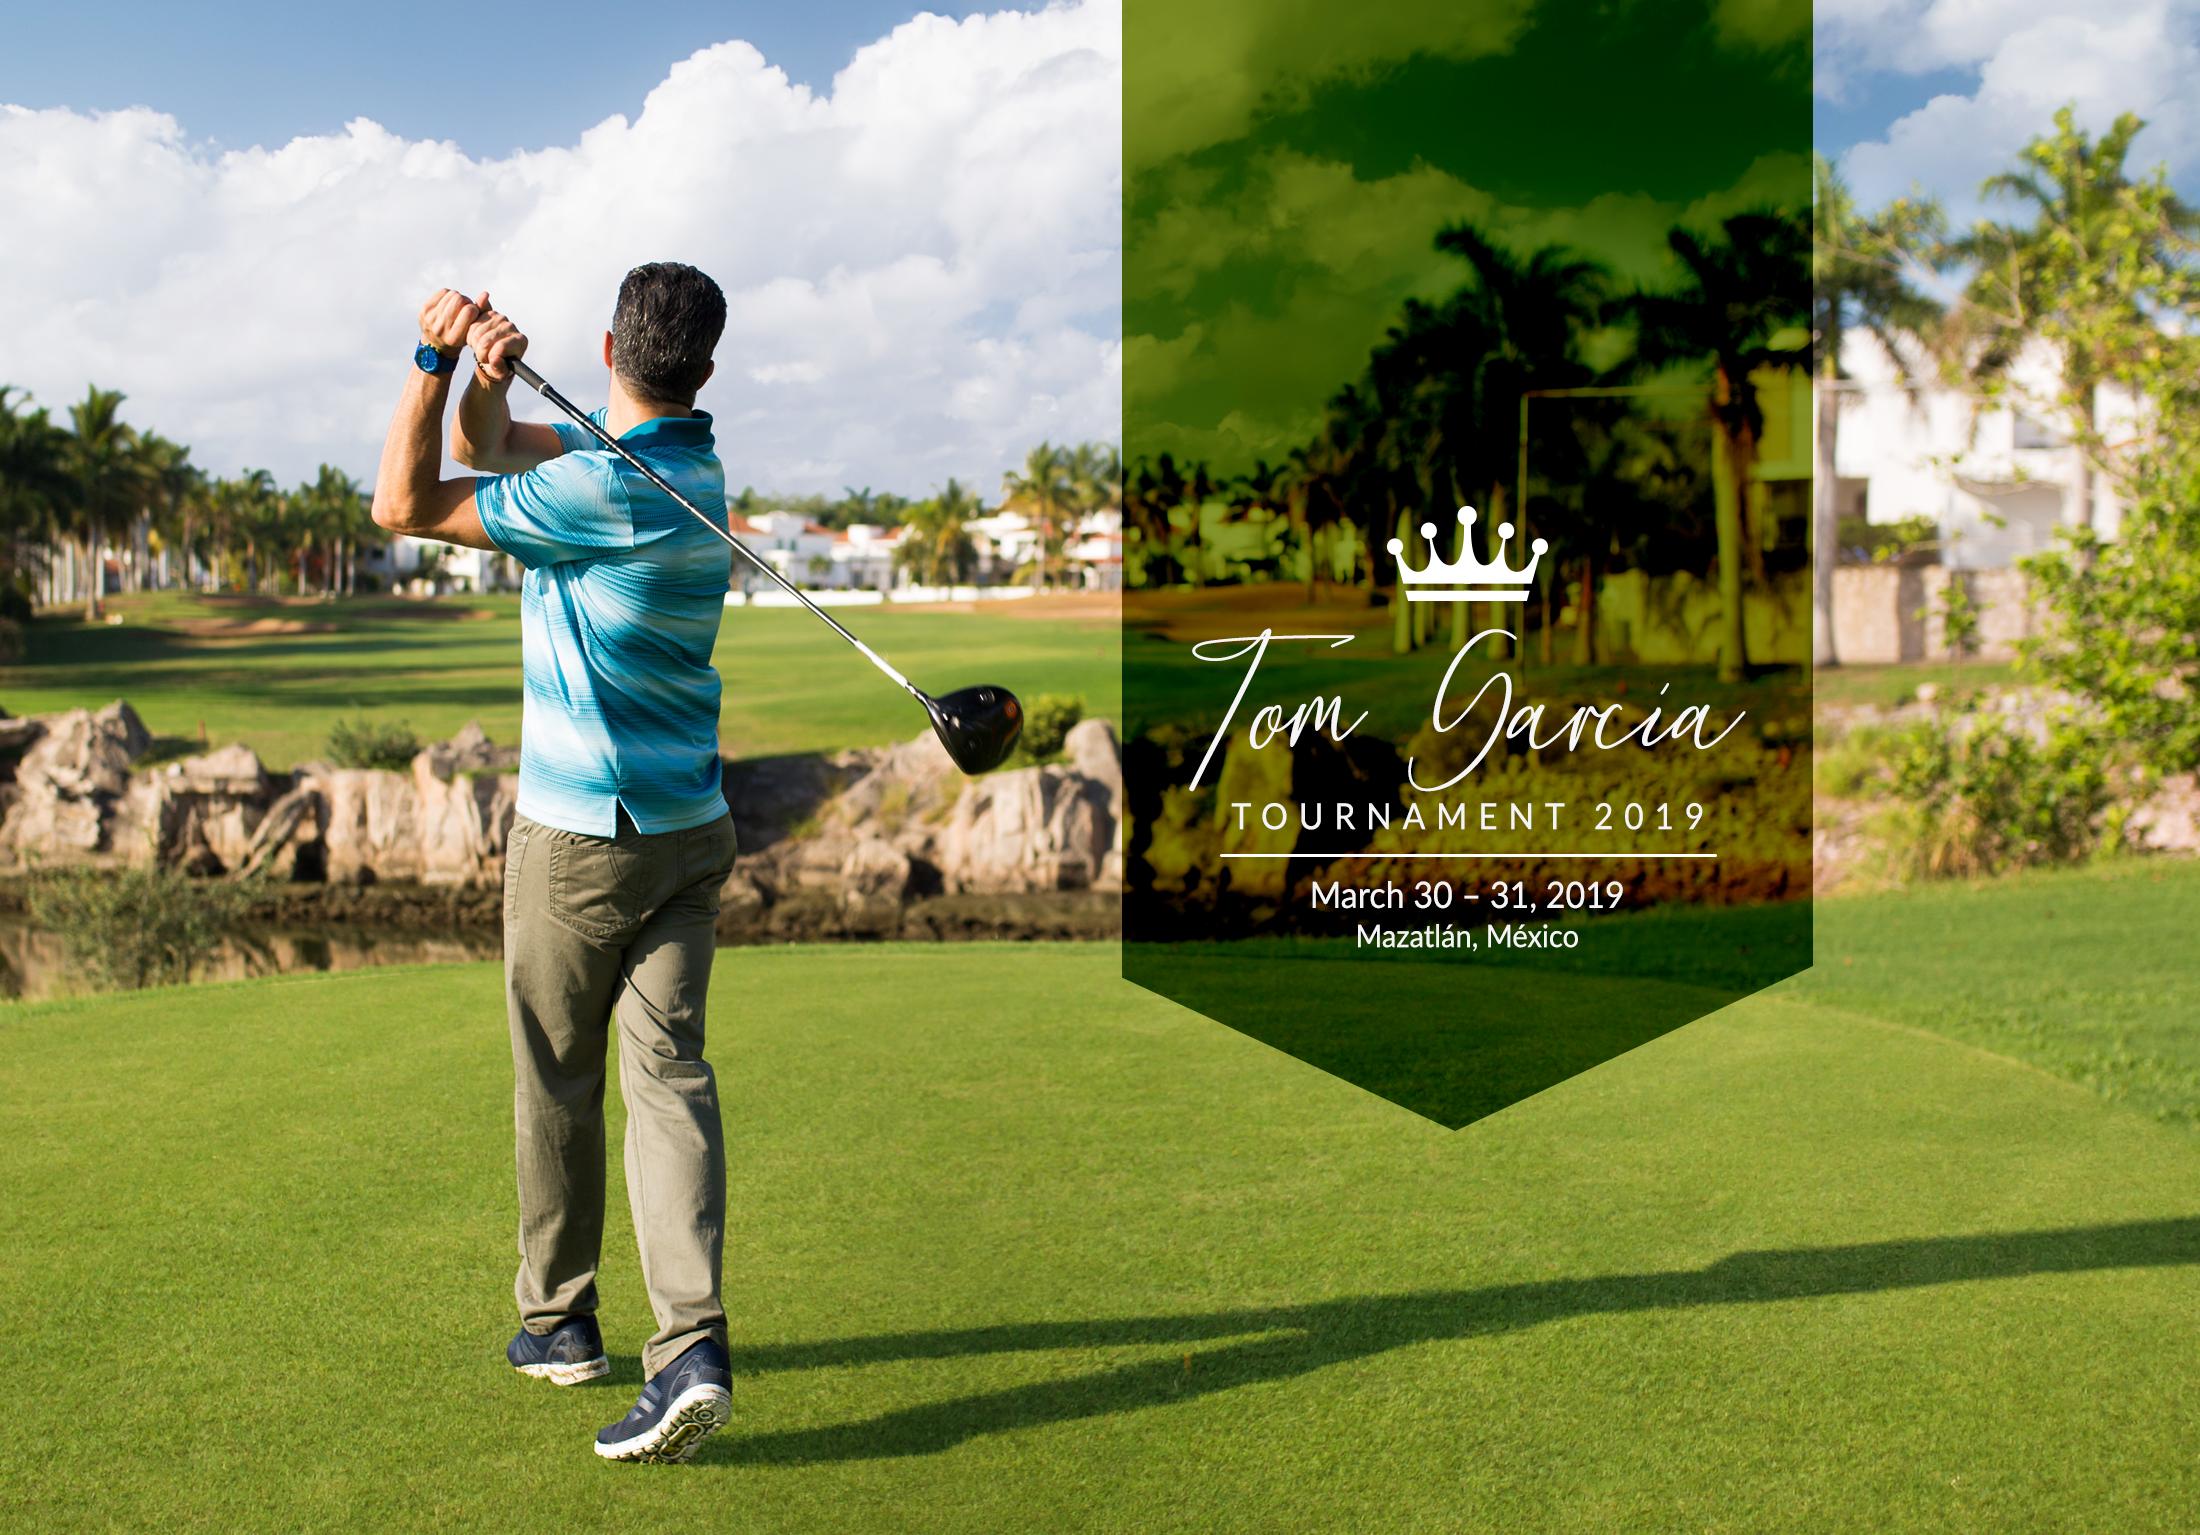 Tom García – Golf Tournament 2019